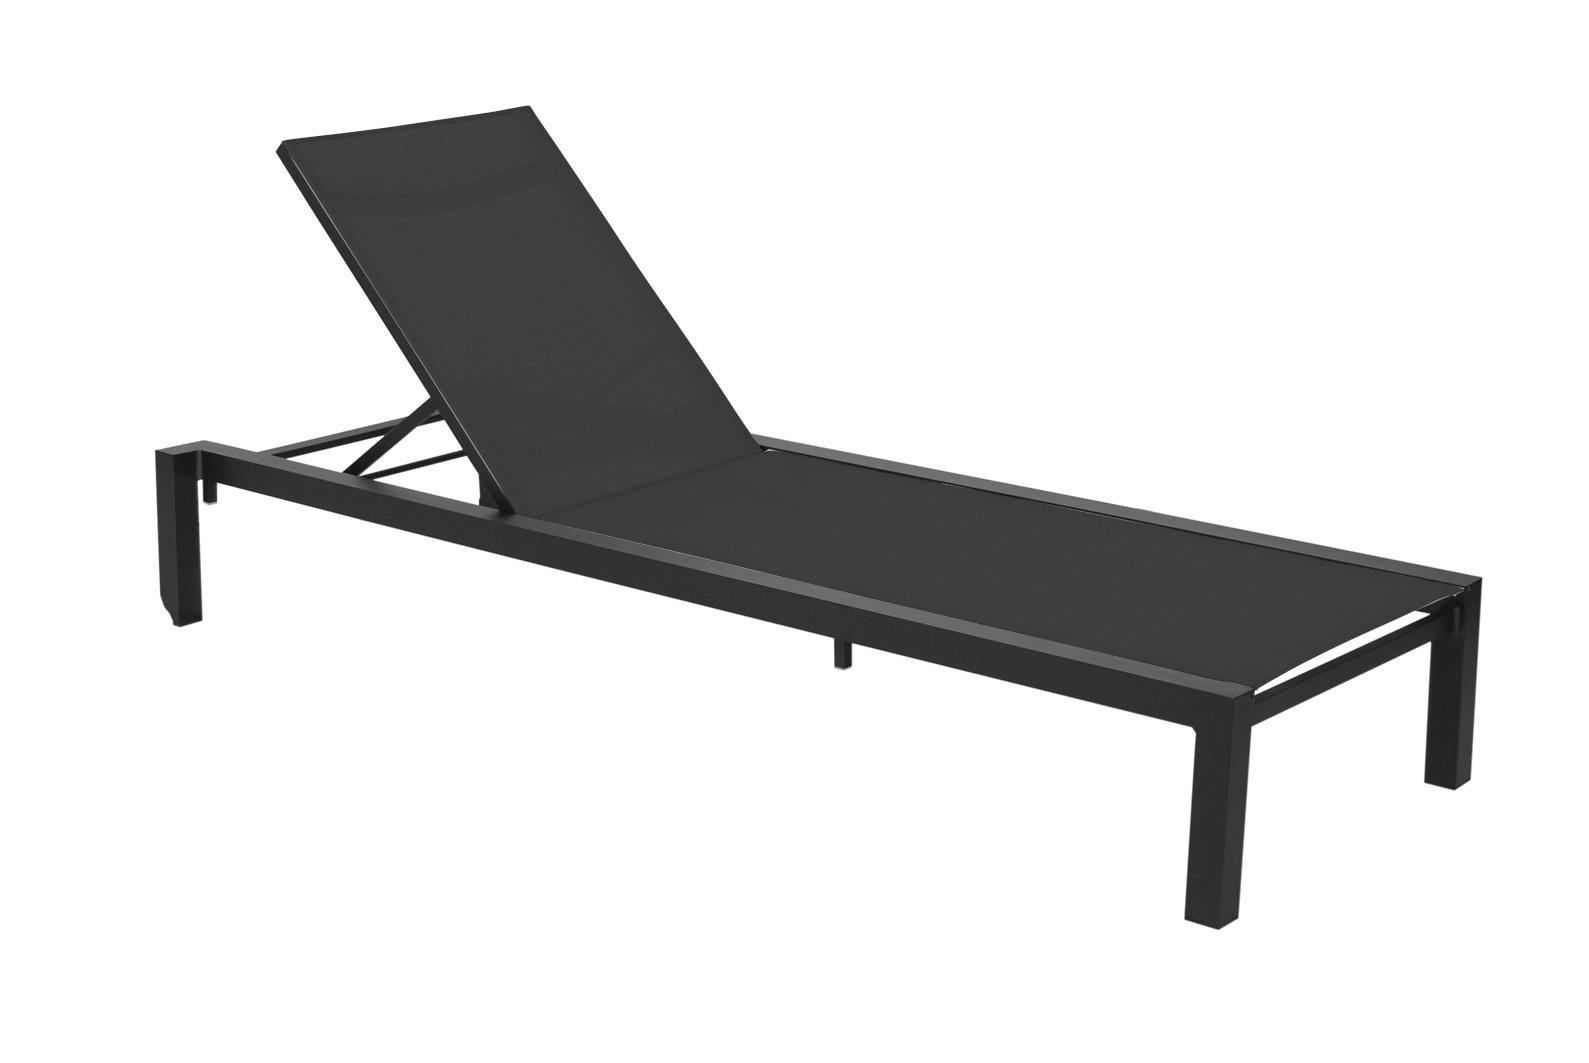 una stapelbare sonnenliege alu synthetikgewebe von calma. Black Bedroom Furniture Sets. Home Design Ideas